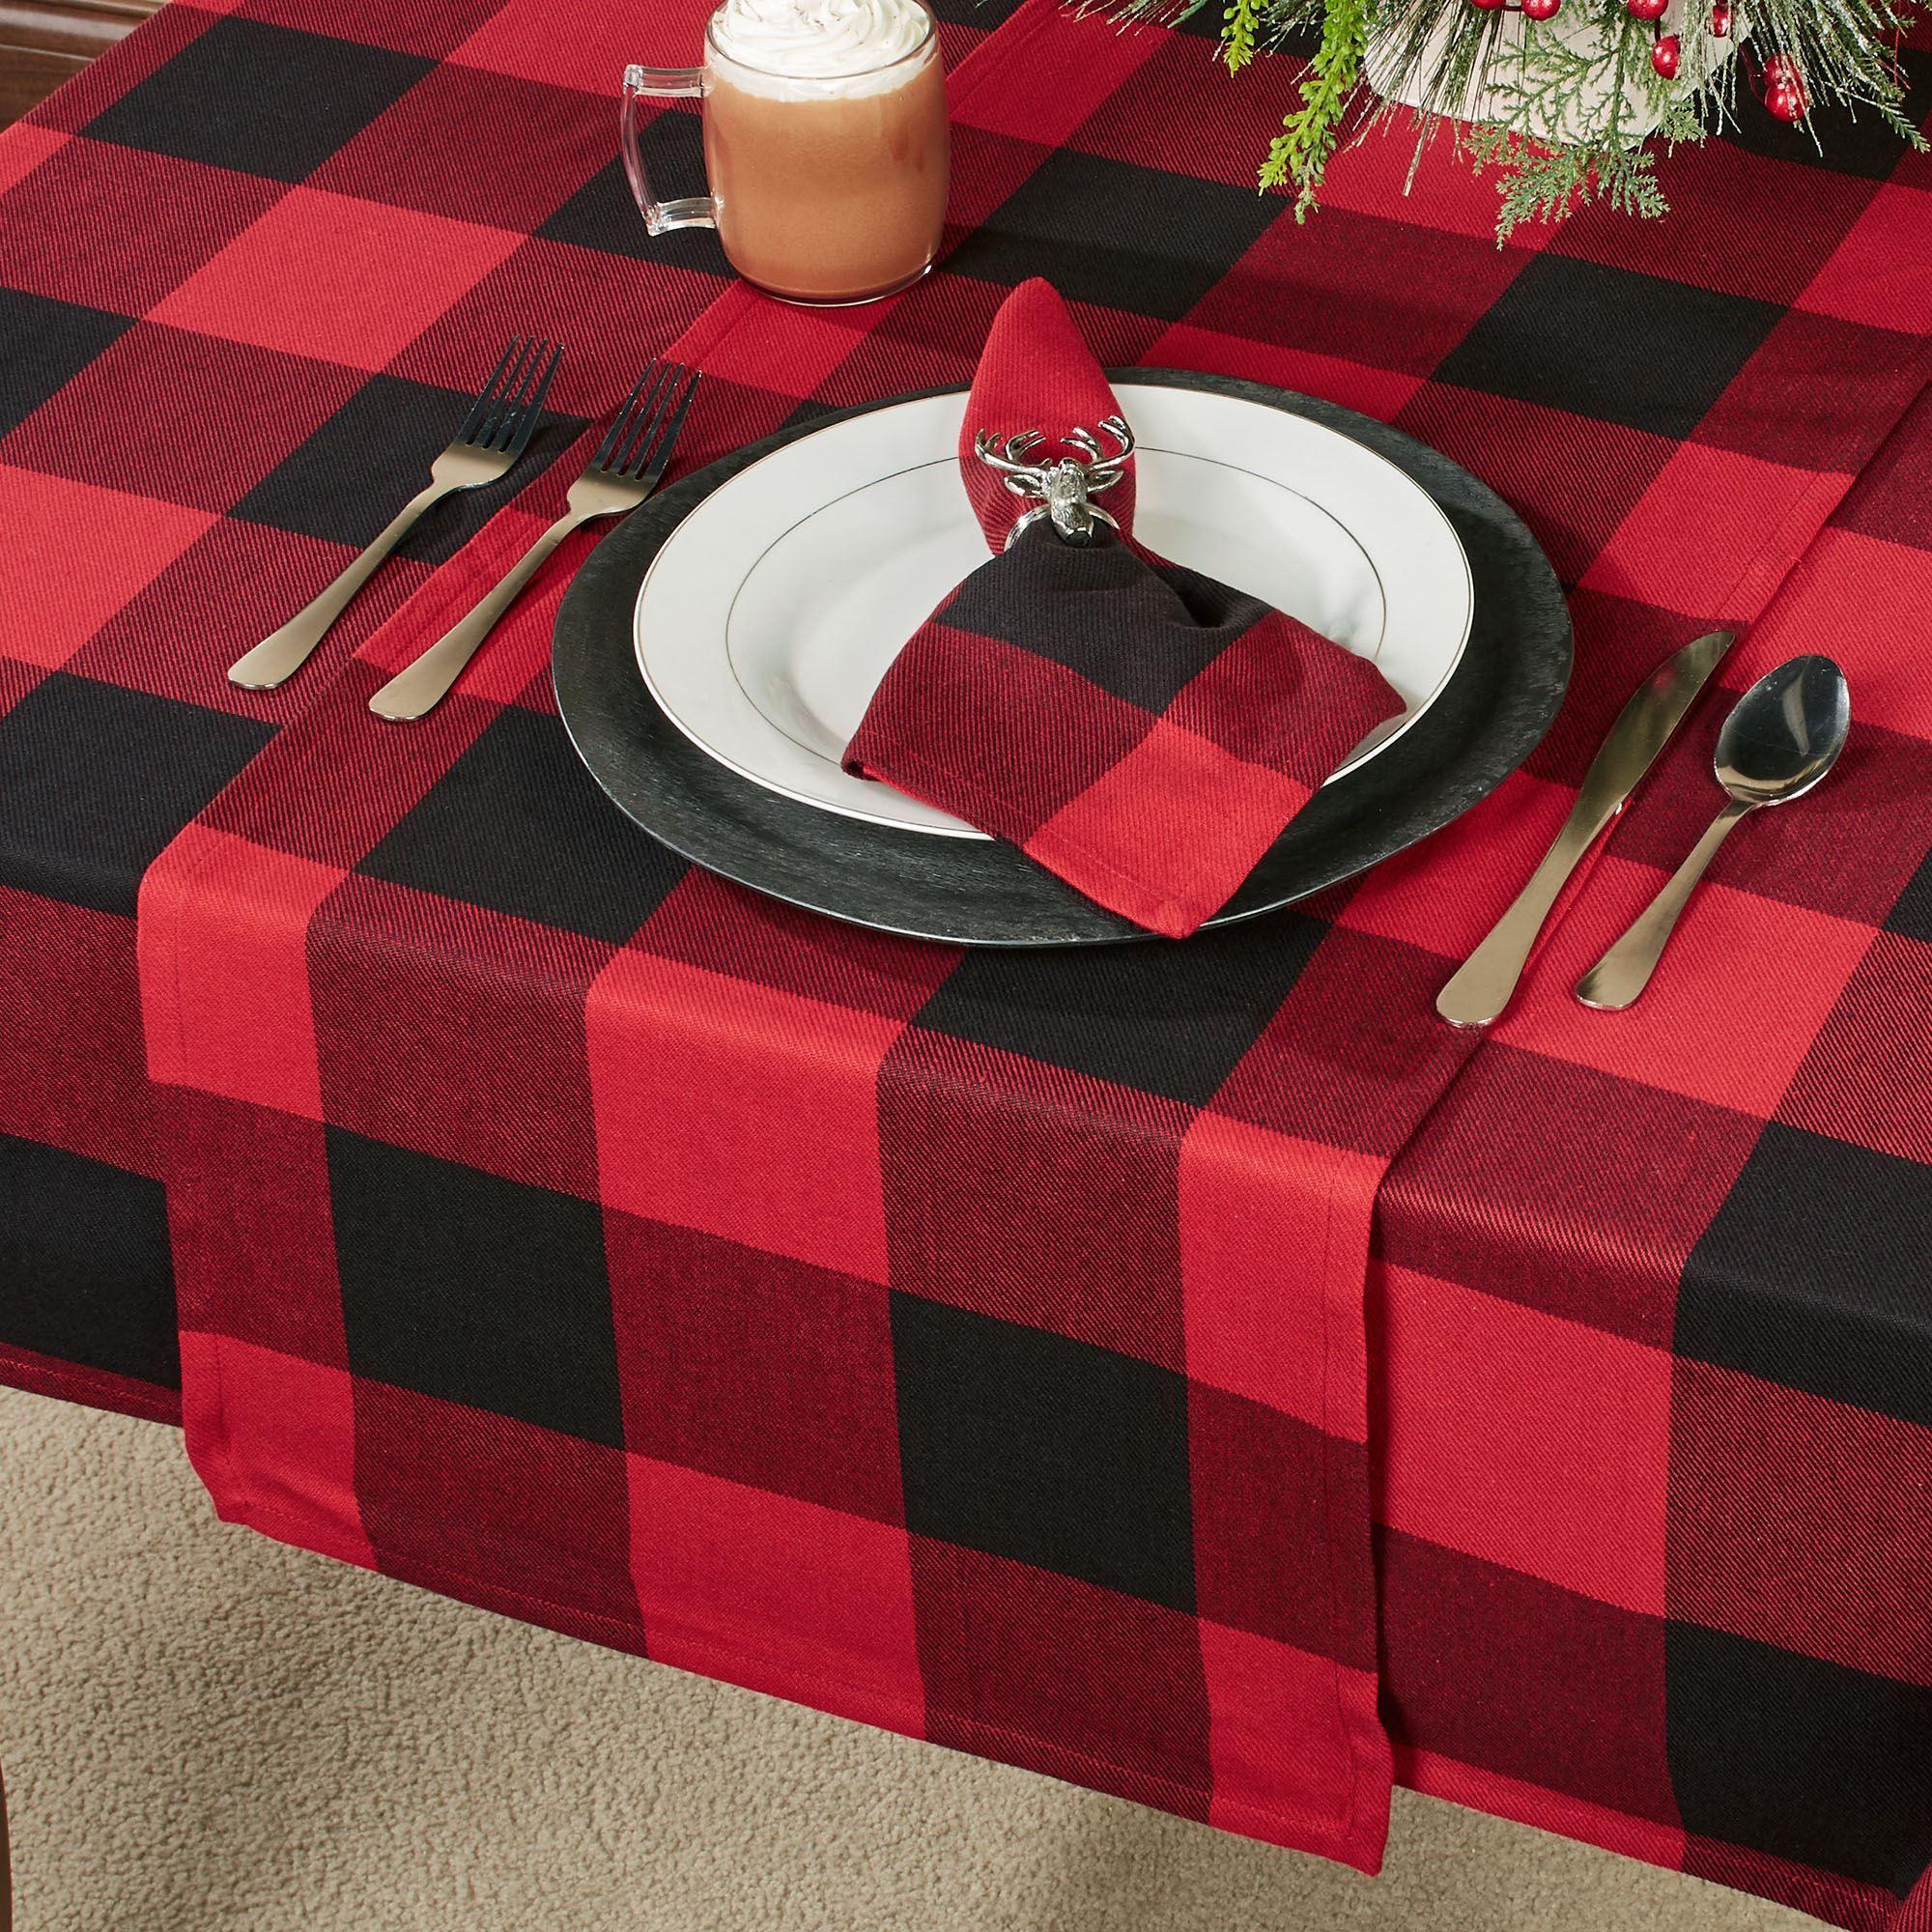 Incroyable Rustic Buffalo Plaid Table Runner Red/Black 16 X 72